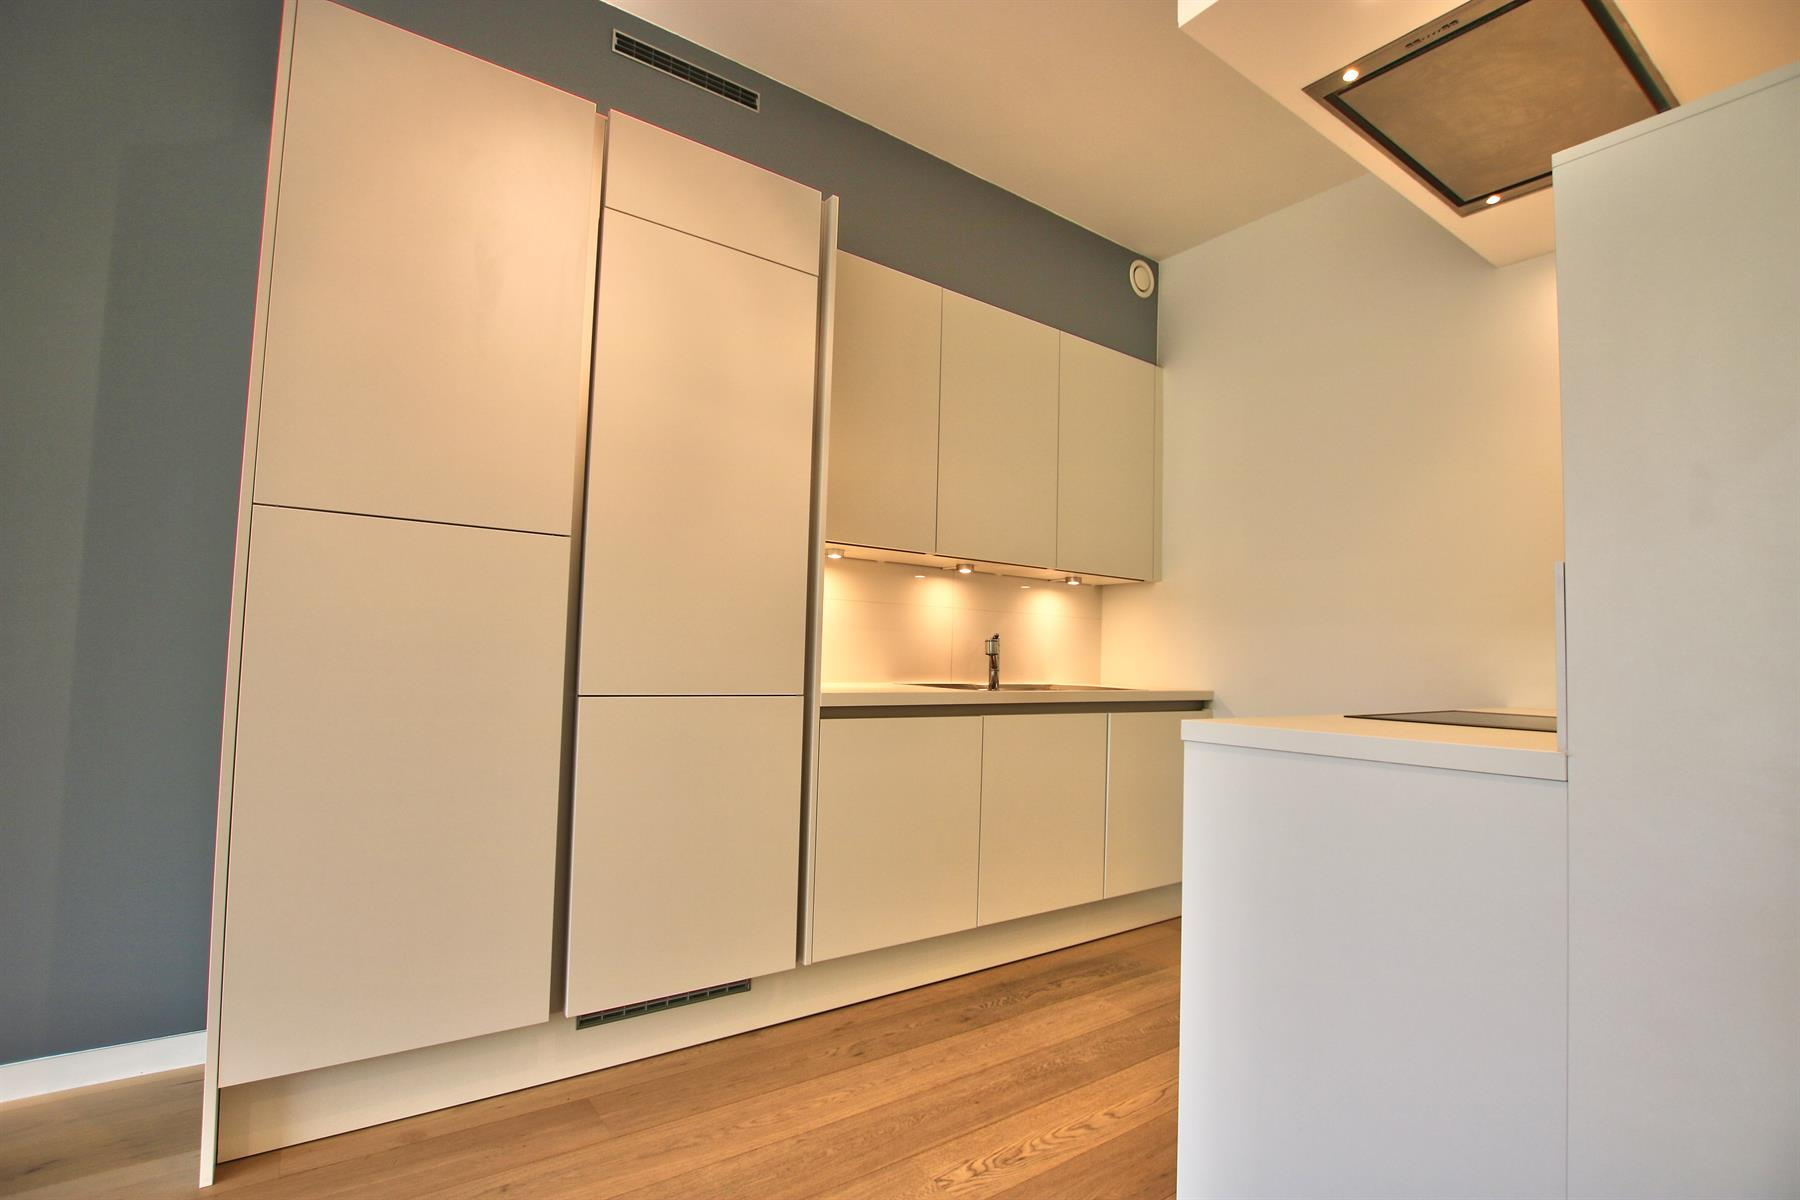 Appartement - Woluwe-Saint-Lambert - #4324368-15